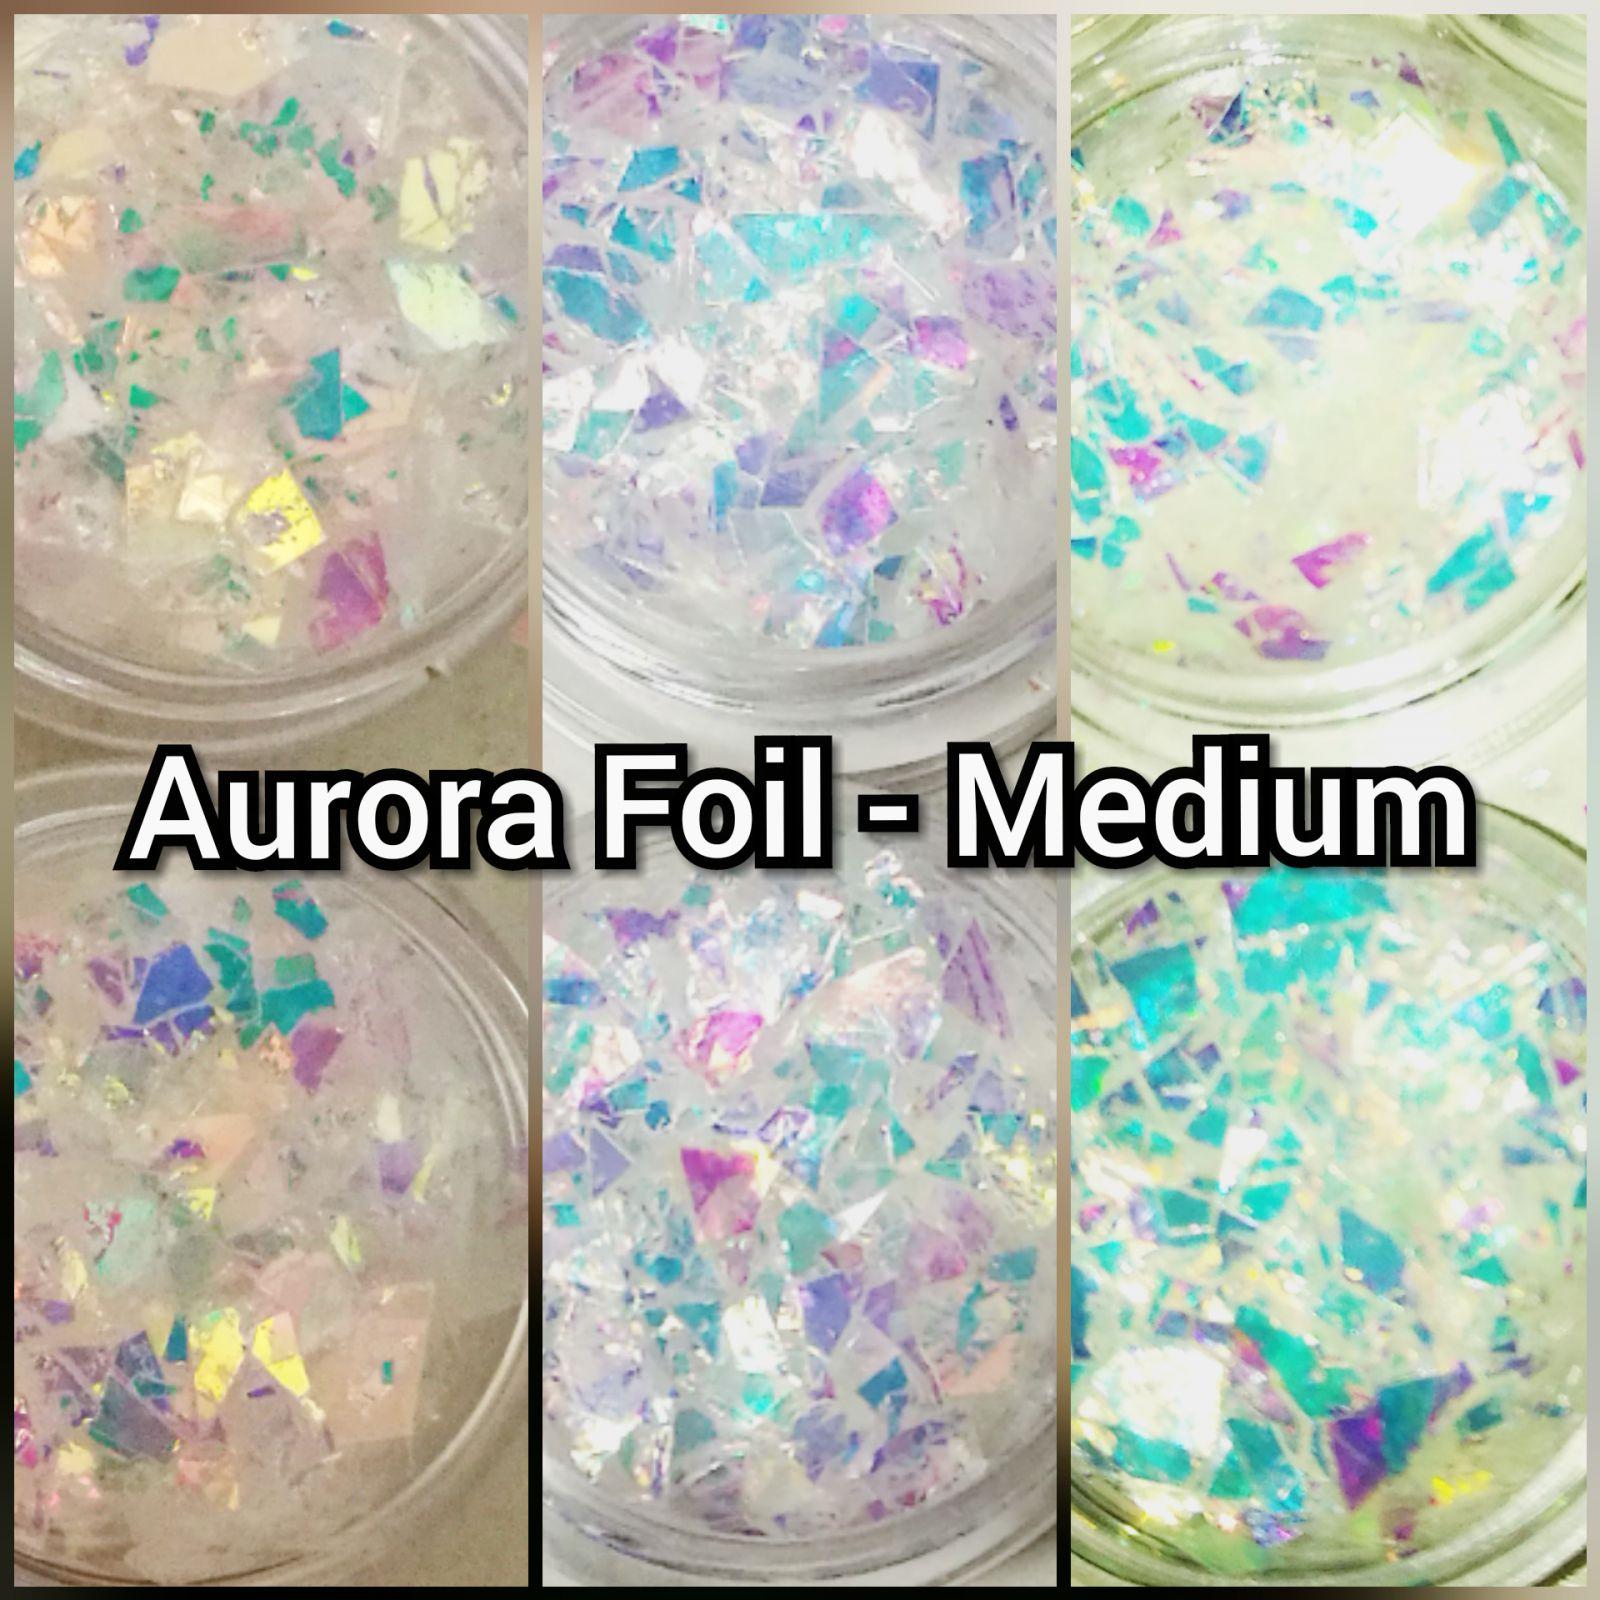 Drvení fólia na nechty Aurora Foil - Medium